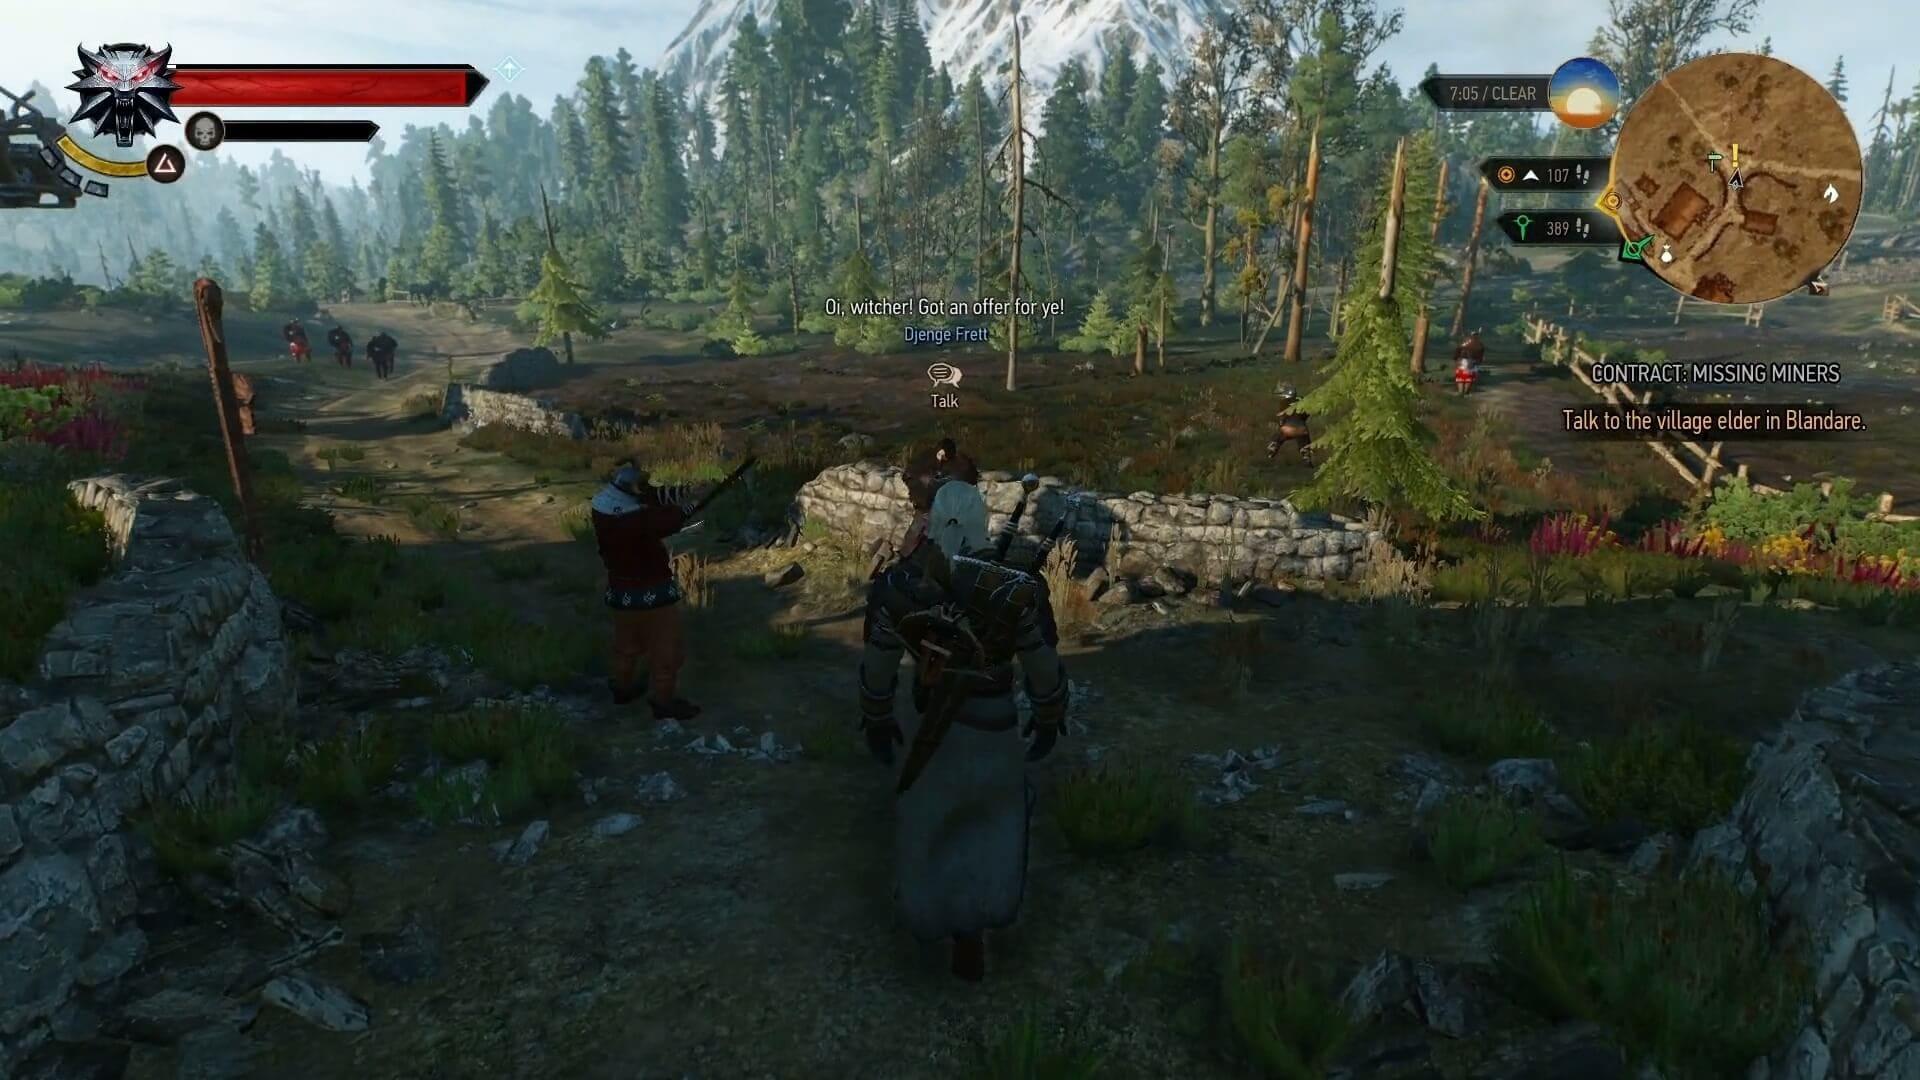 witcher 3 wild hunt quest NPC dialogue